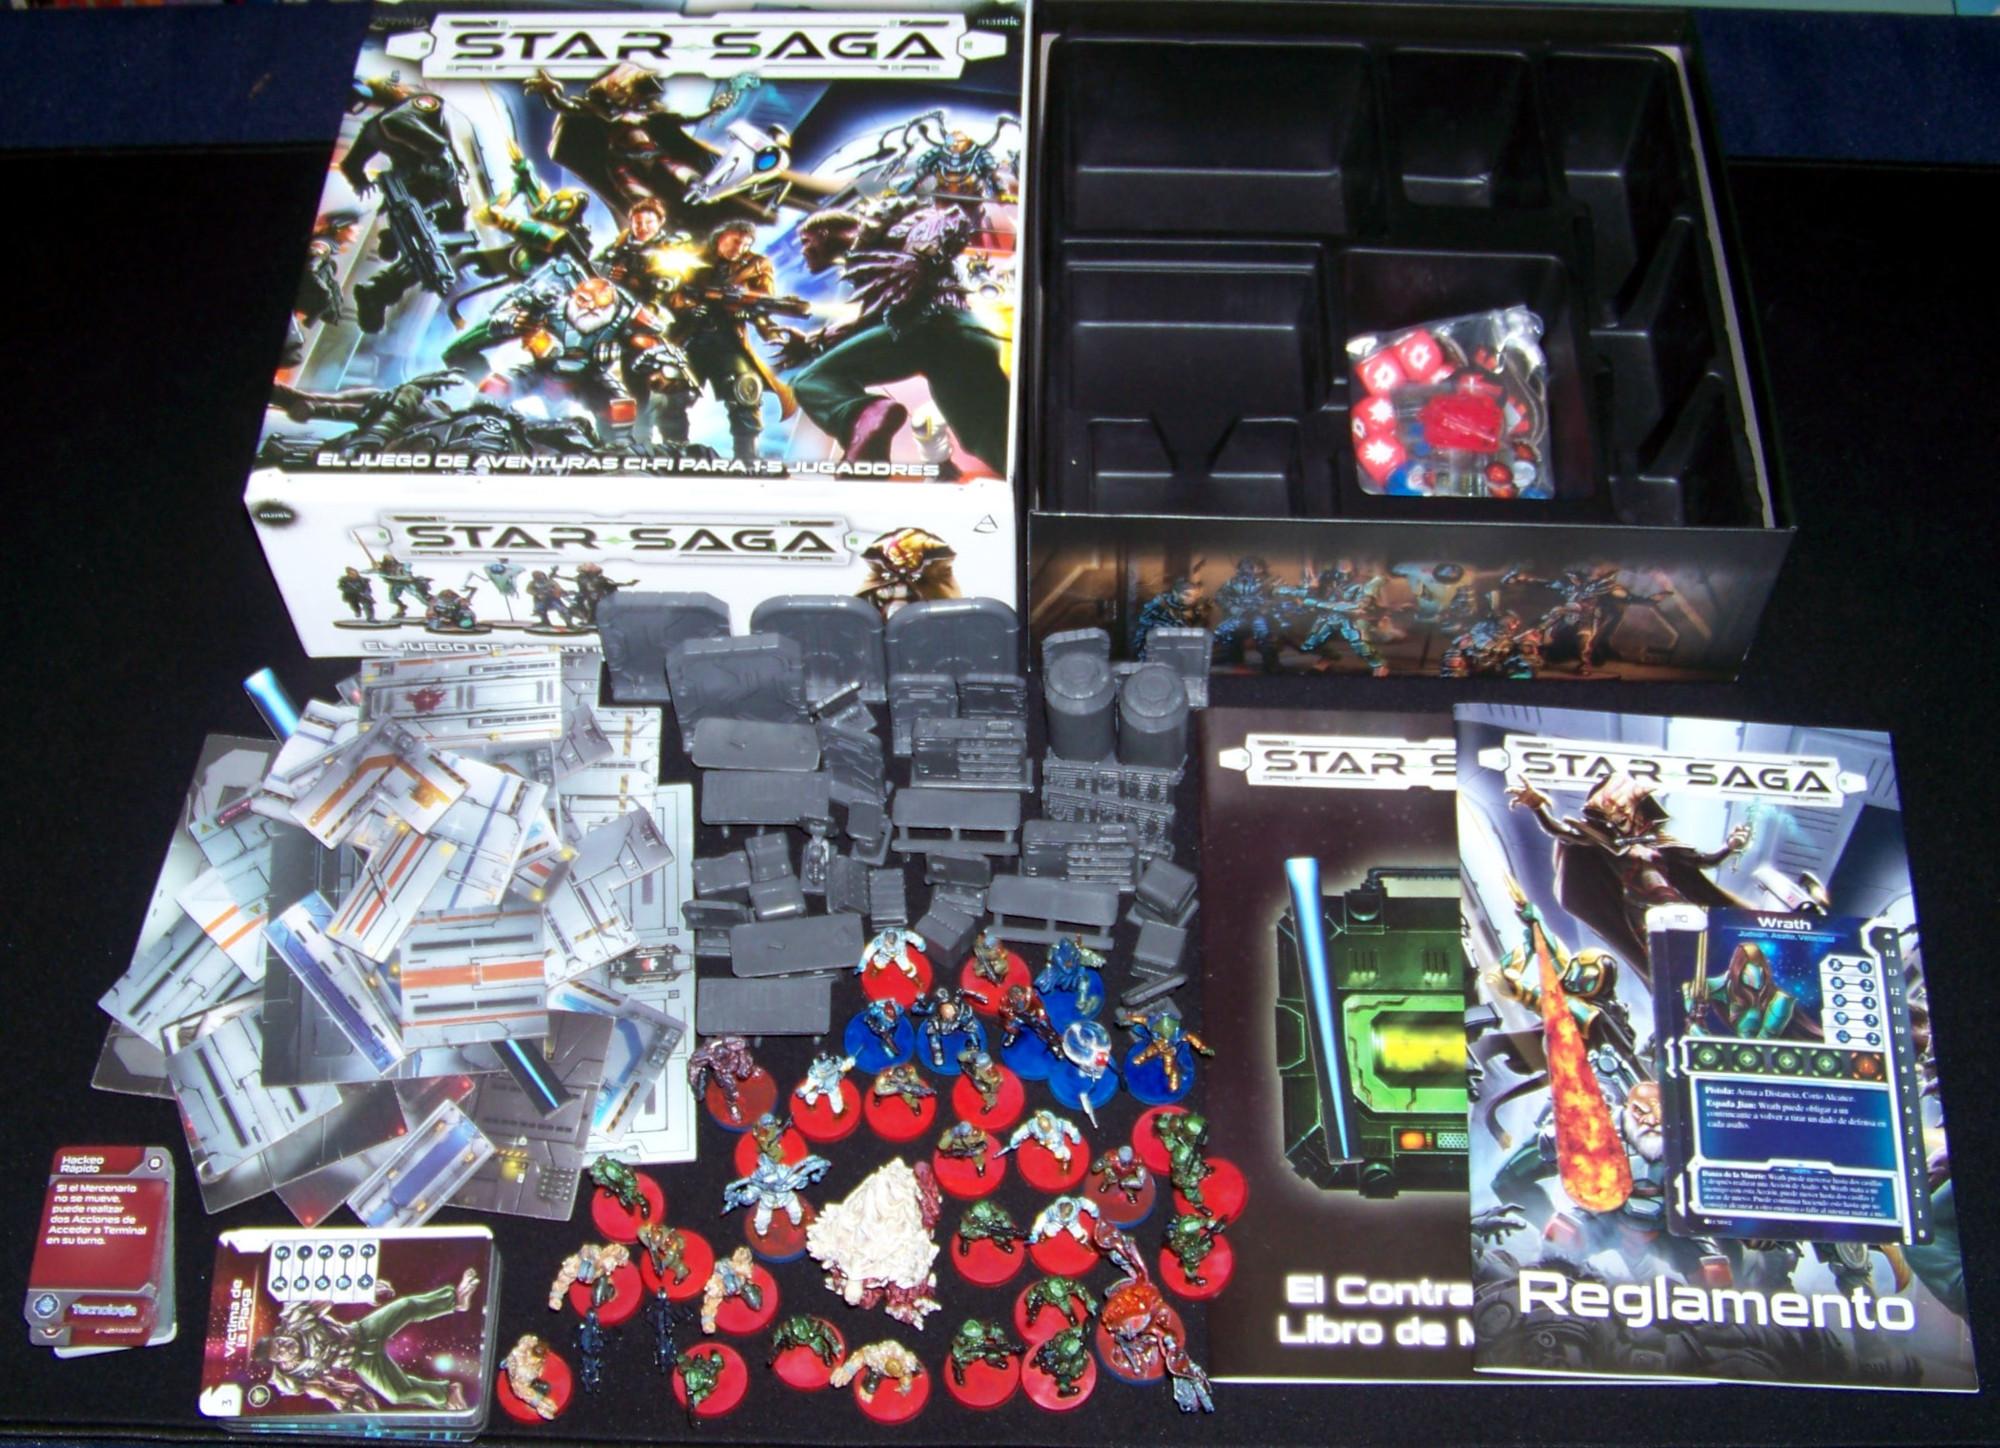 Star Saga - componentes